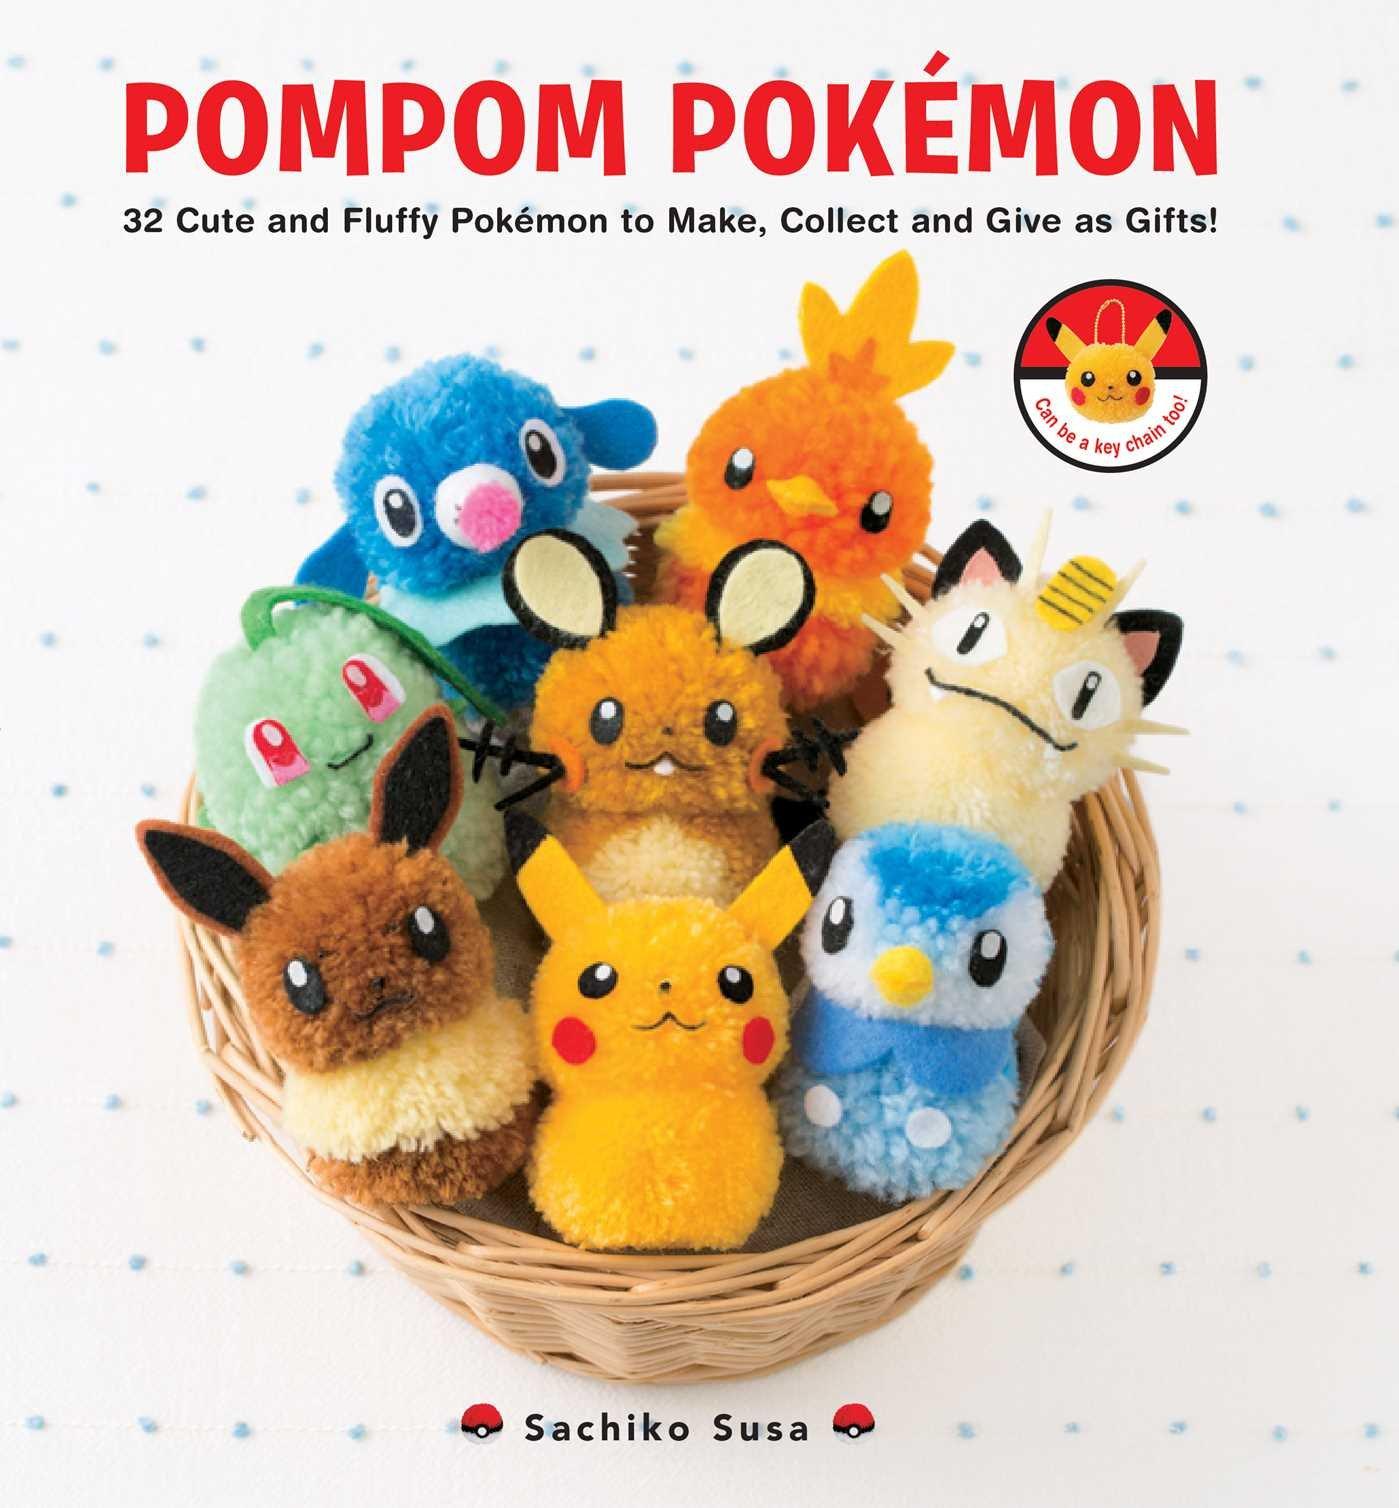 Pompom Pokémon (Pompom Pokemon)